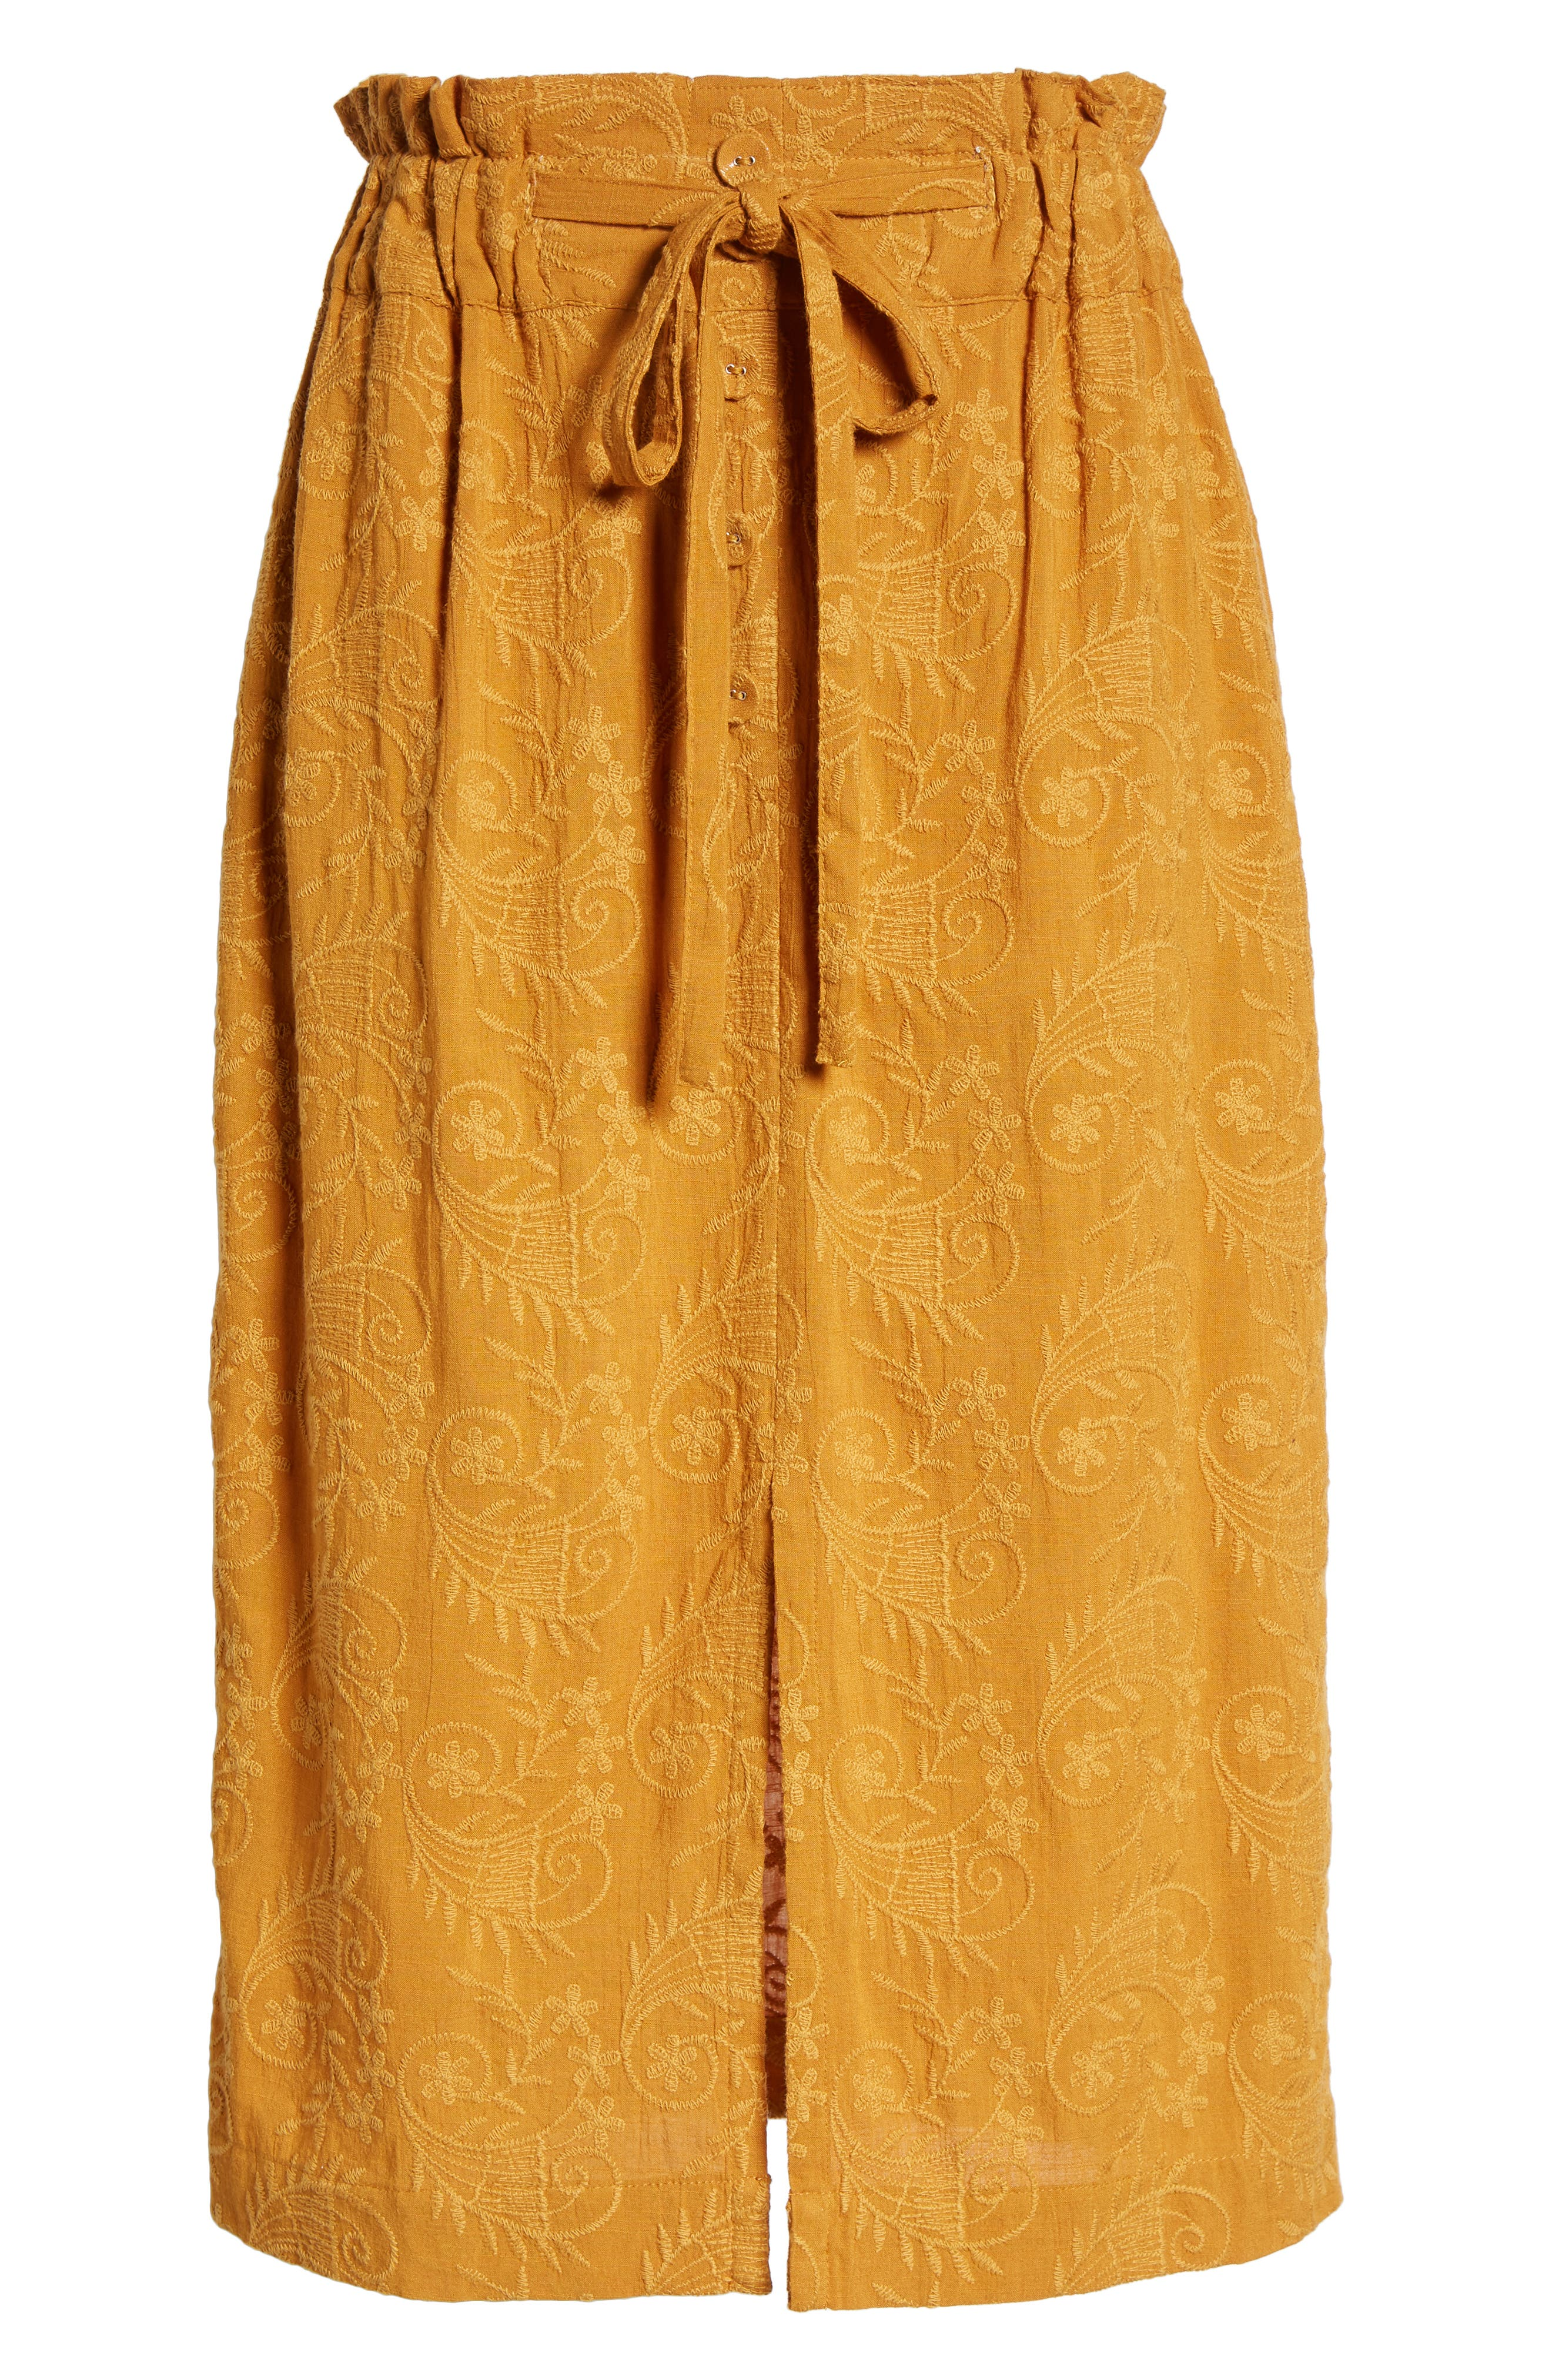 Embroidered Paperbag Waist Skirt,                             Alternate thumbnail 6, color,                             700